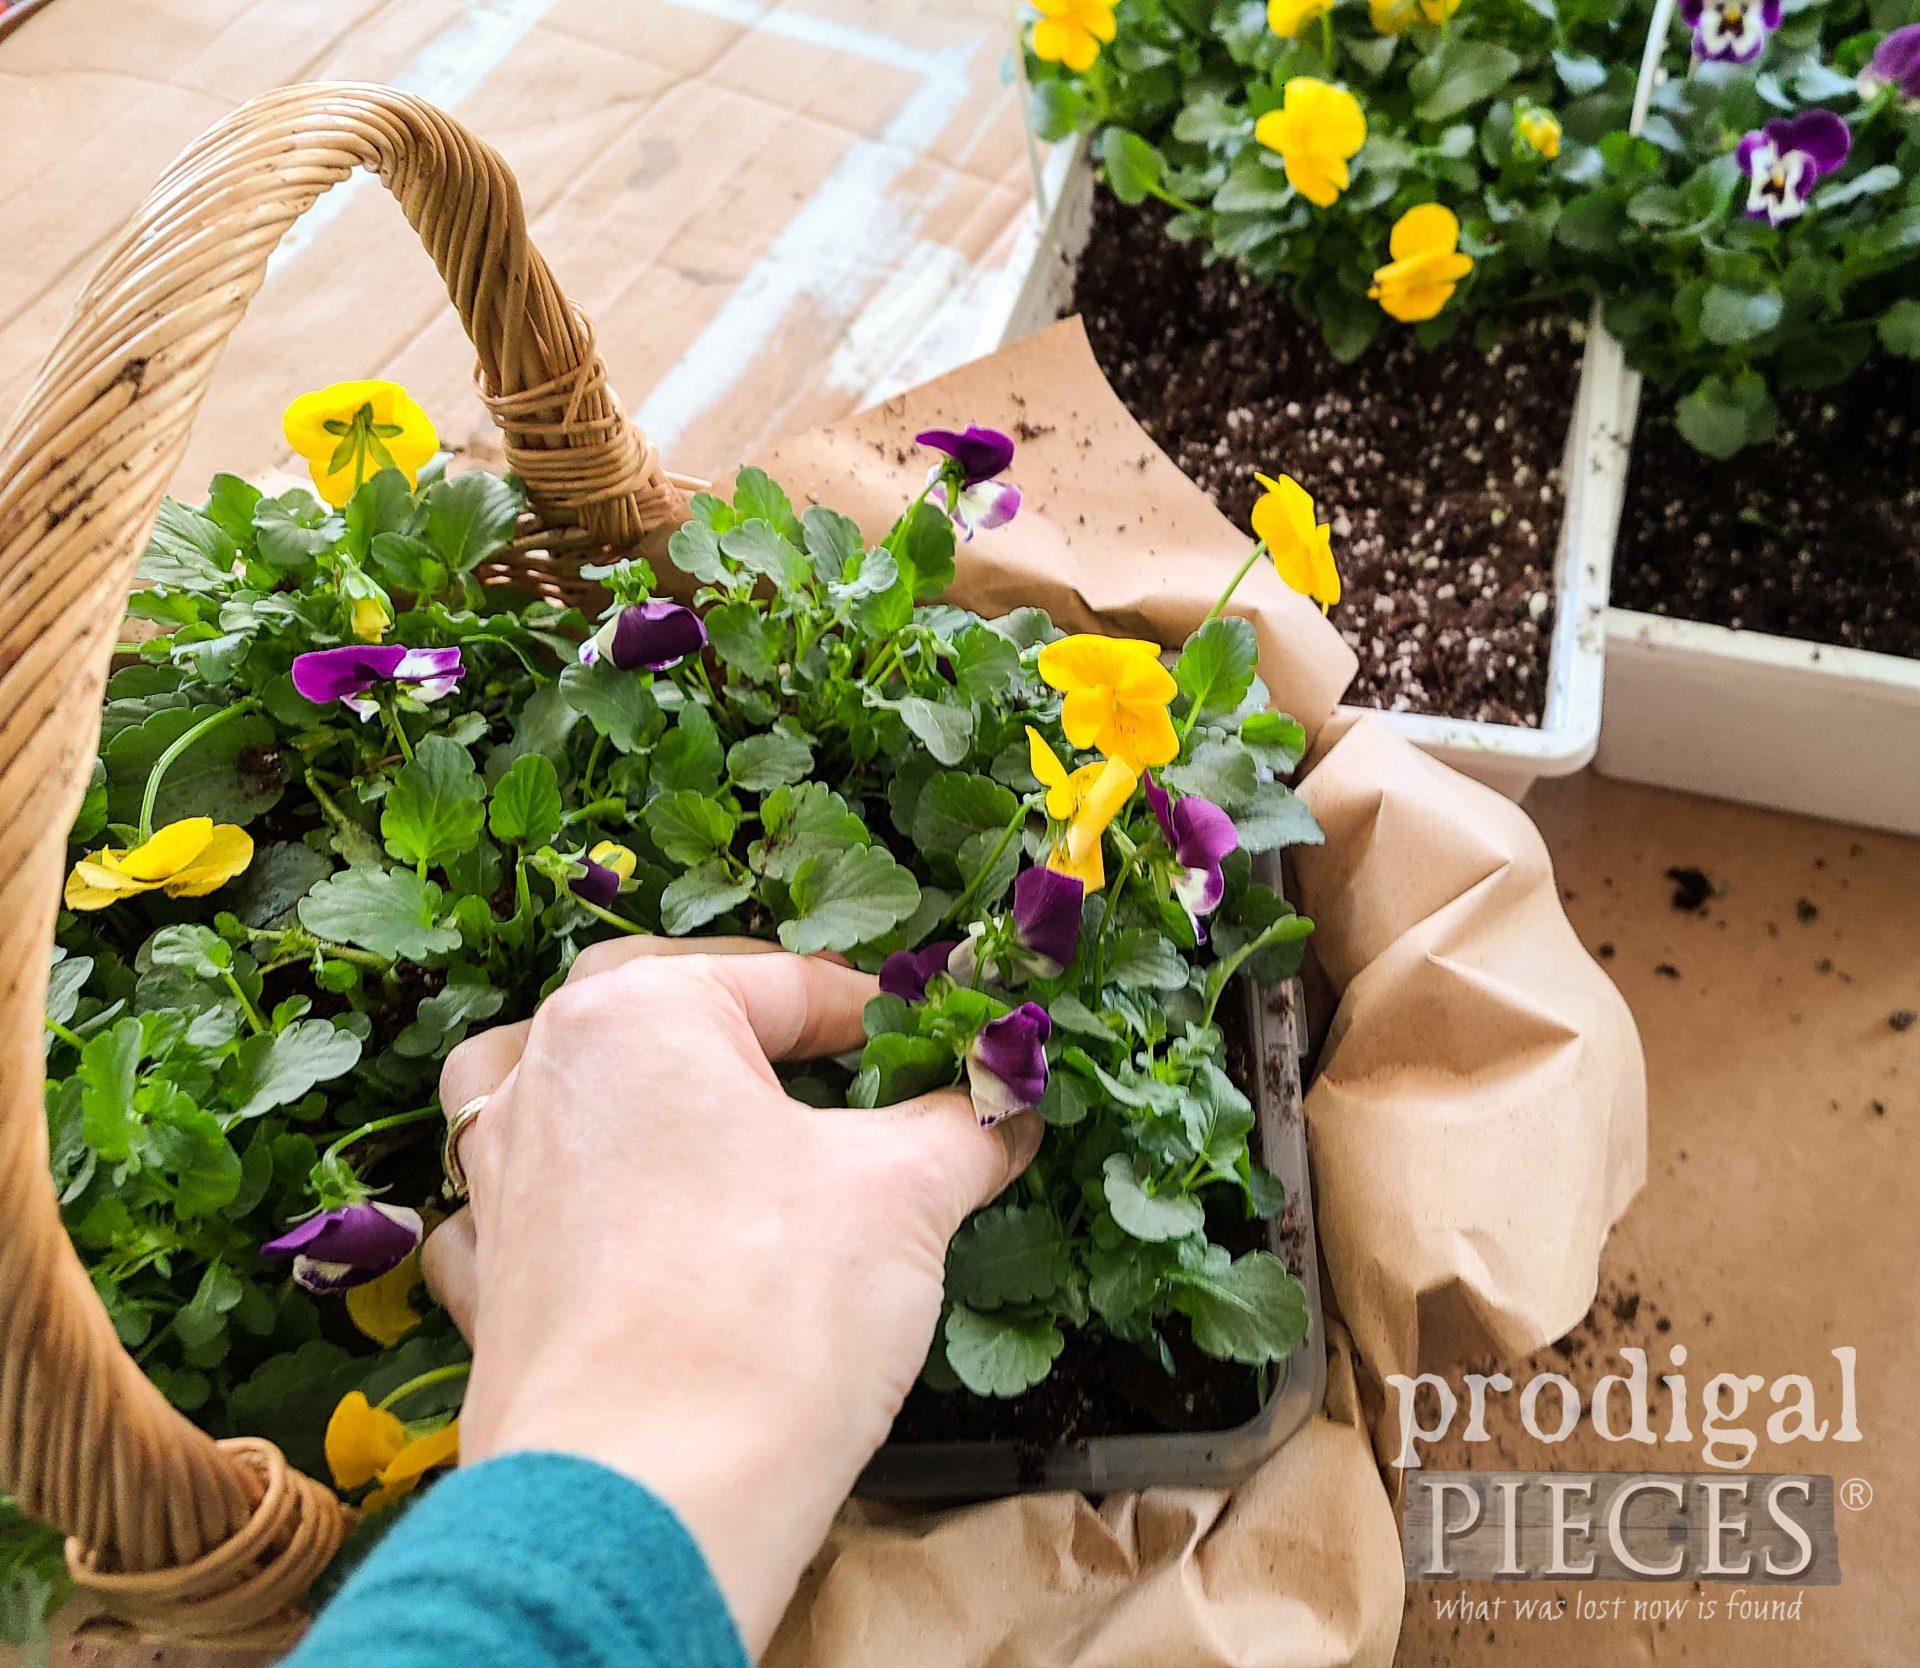 Planting Violas in Centerpiece by Larissa of Prodigal Pieces | prodigalpieces.com #prodigalpieces